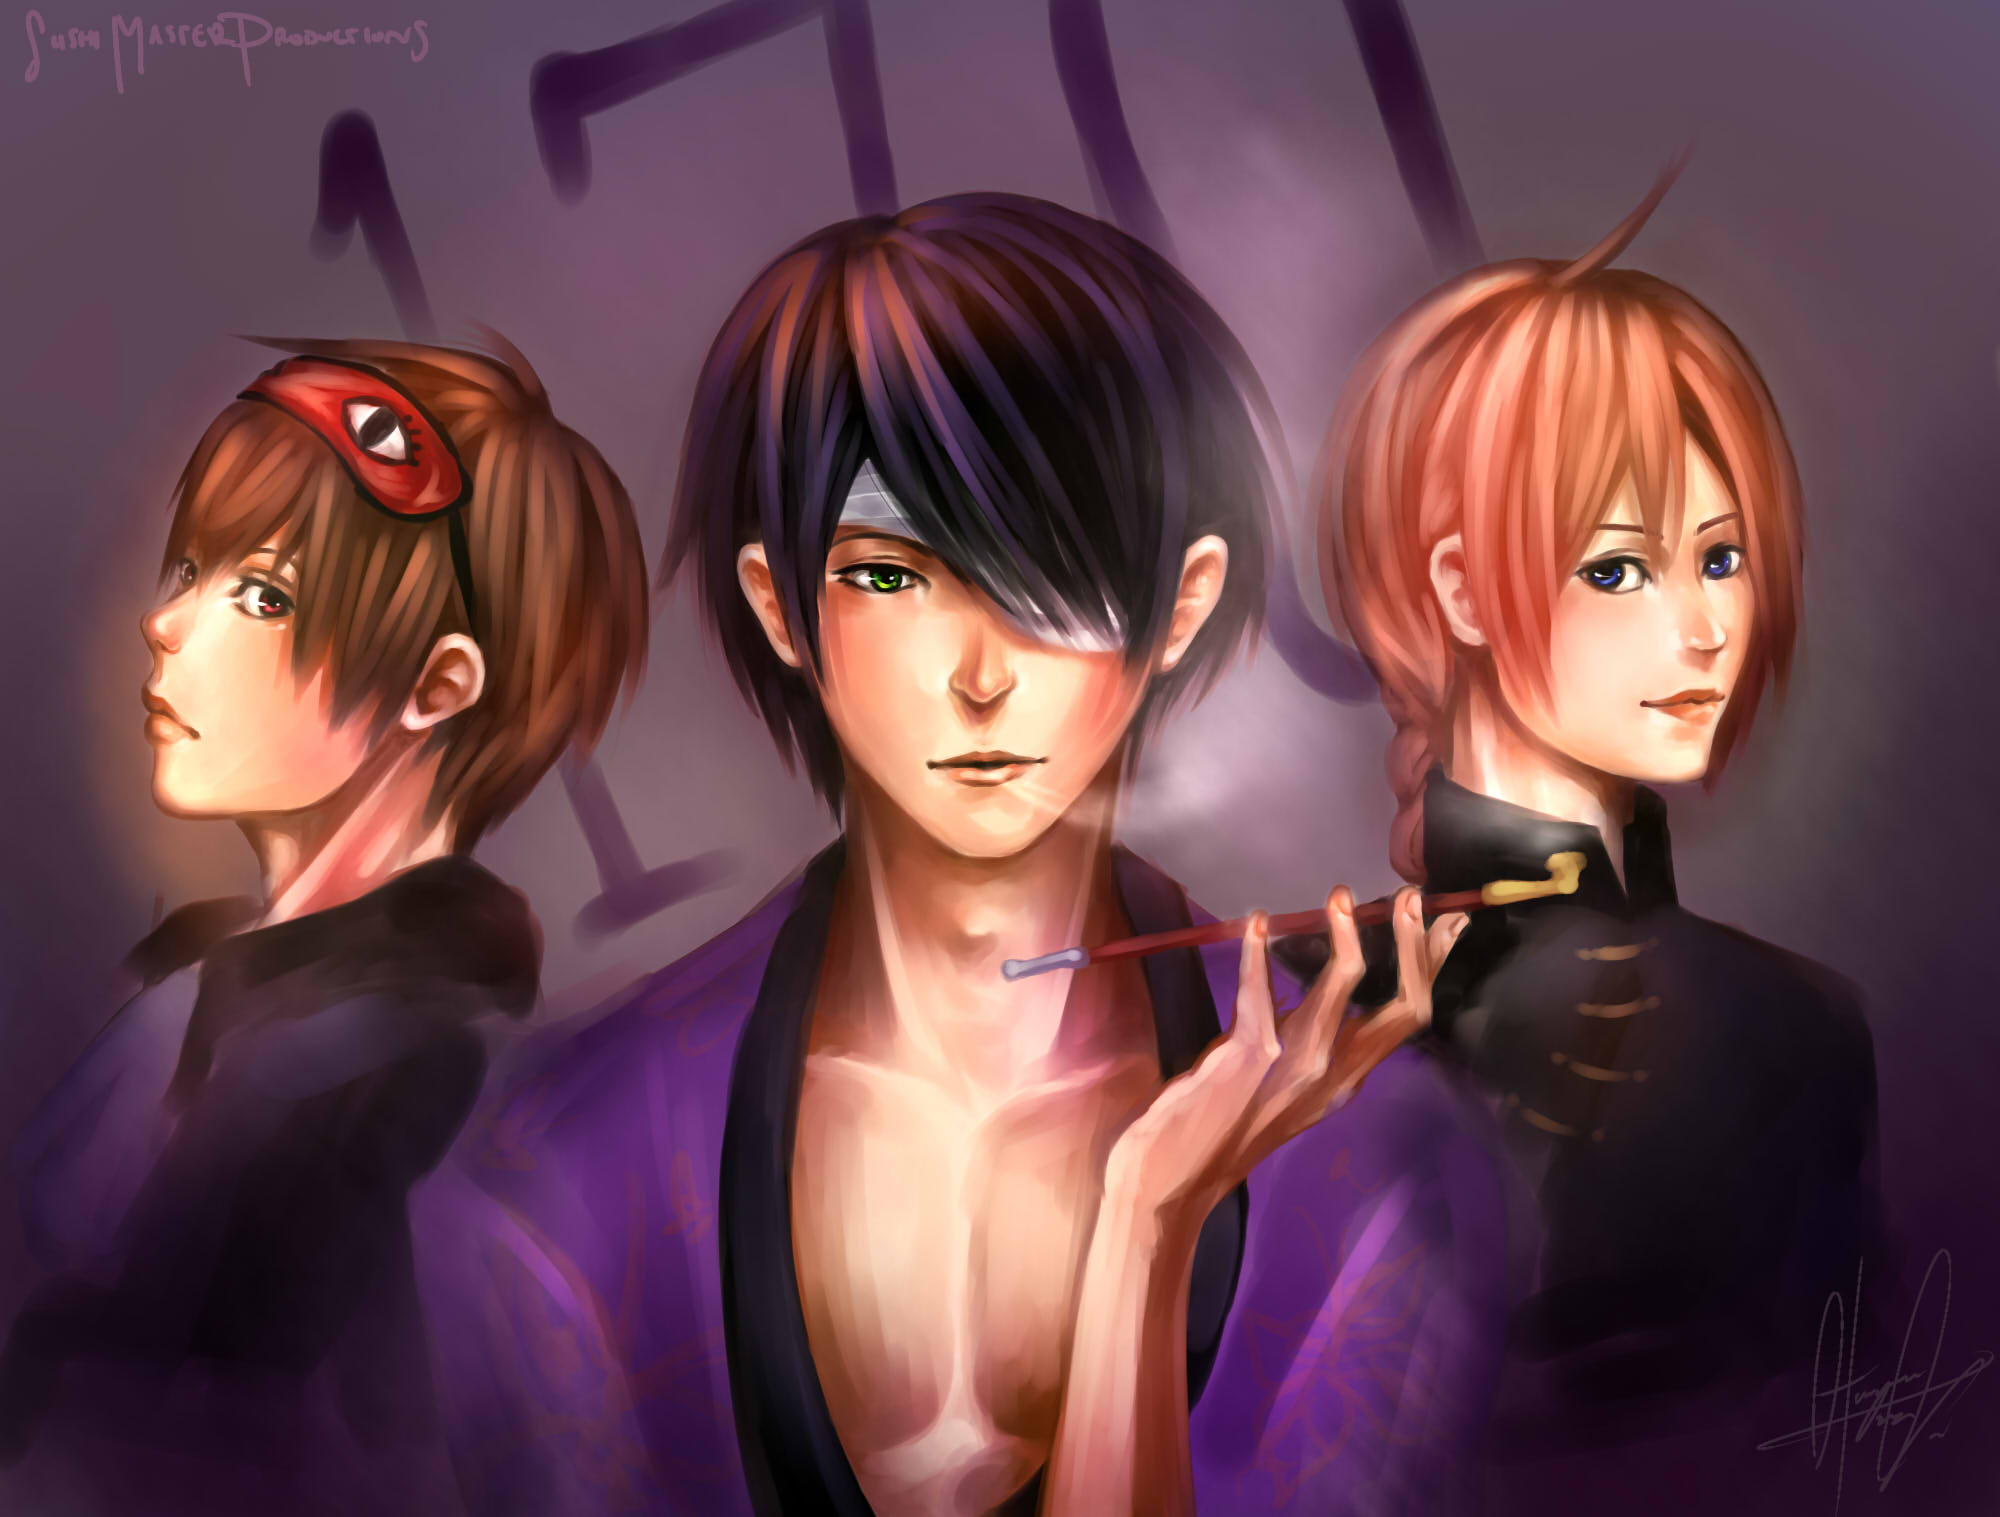 Anime Characters 170 Cm : Cm trio gintama zerochan anime image board